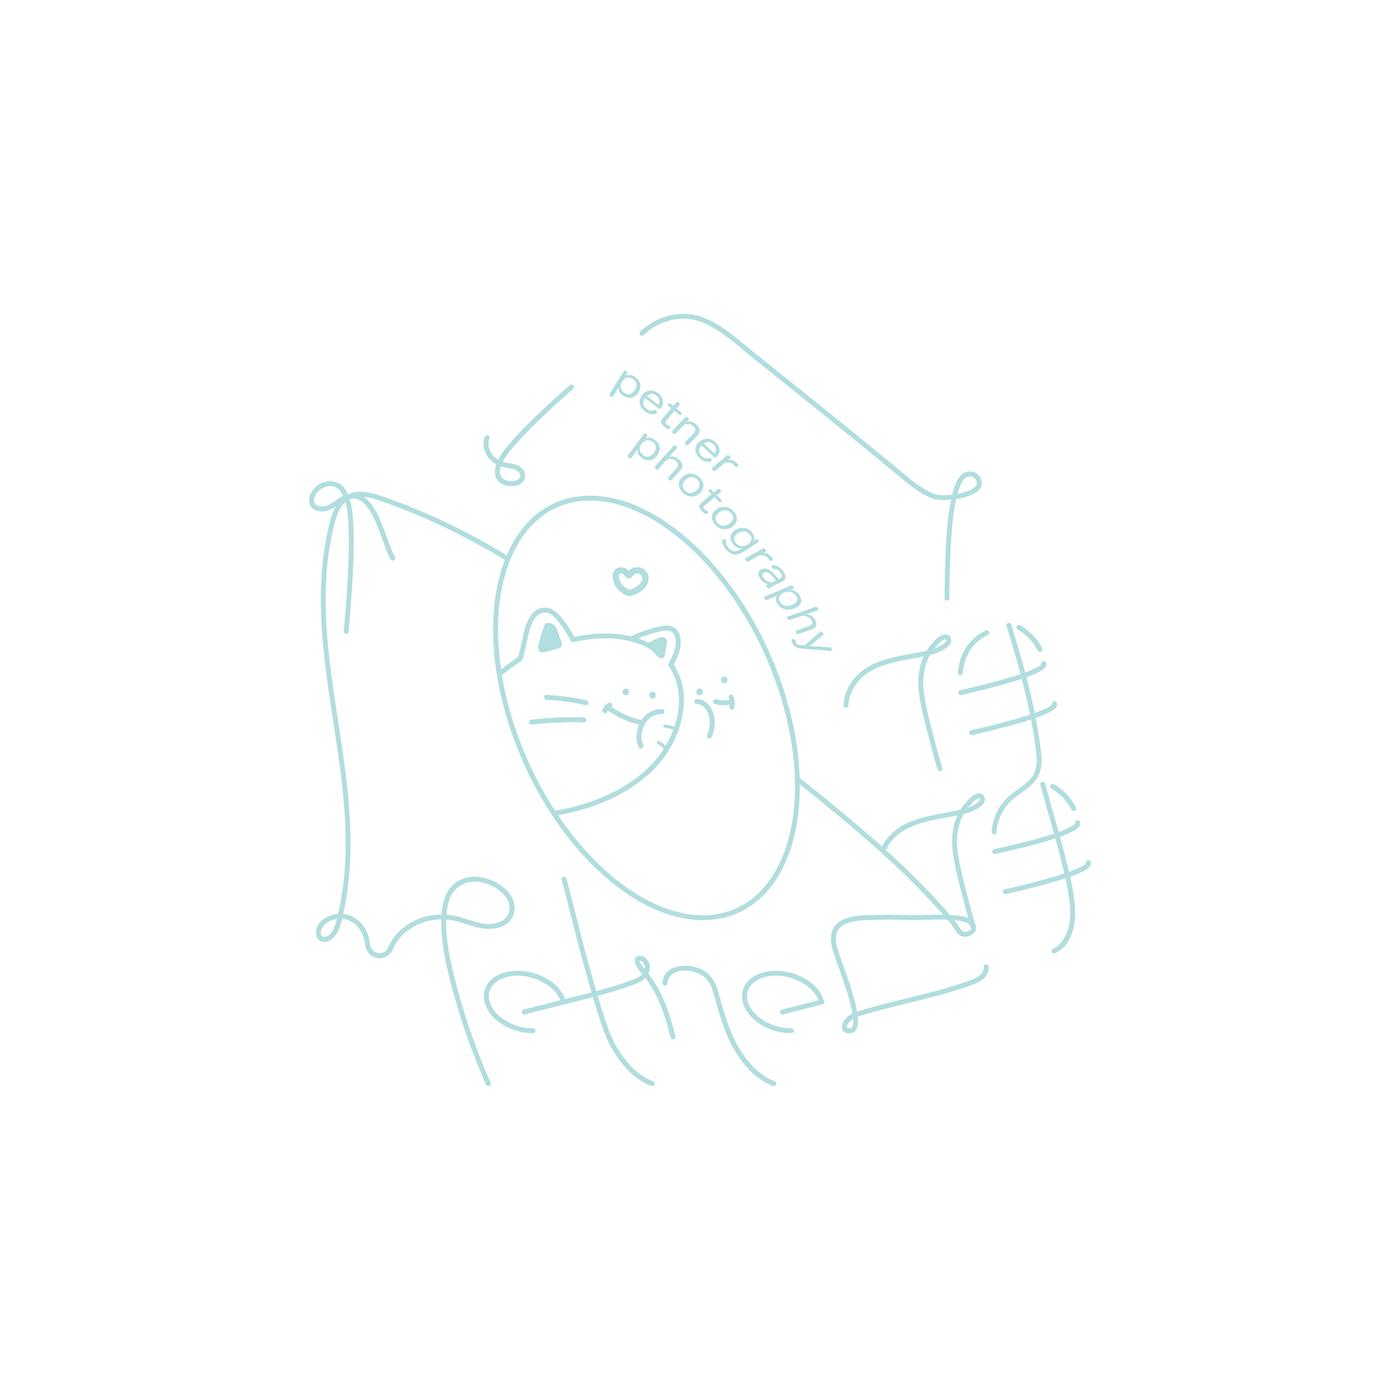 #ci #pet #petner #design #graphic #logo #logotype #cis #branding #blue #cat #Taiwan #Nantou